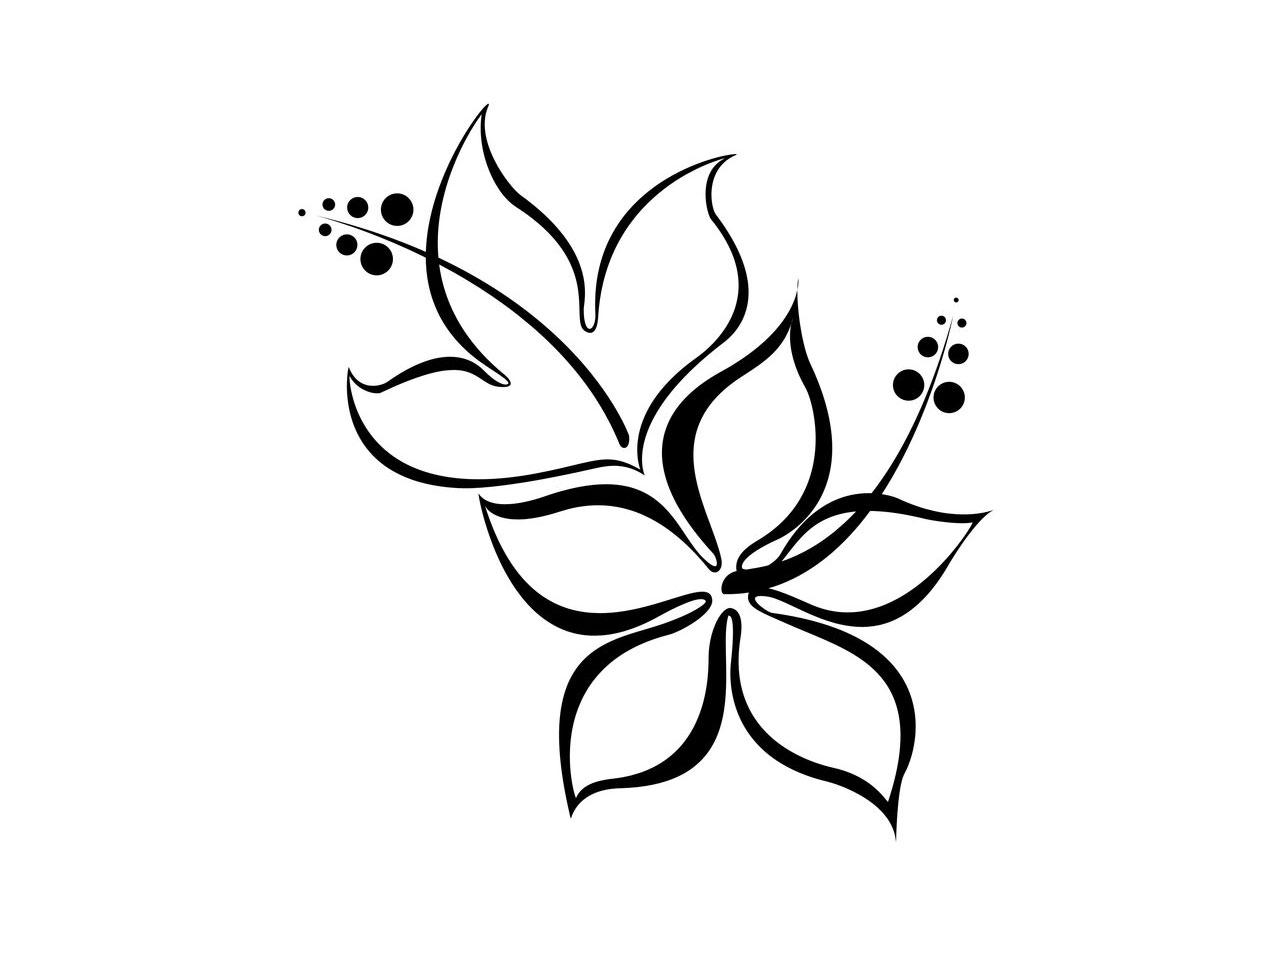 Black Tinkerbell And Little Stars Tattoo Designs